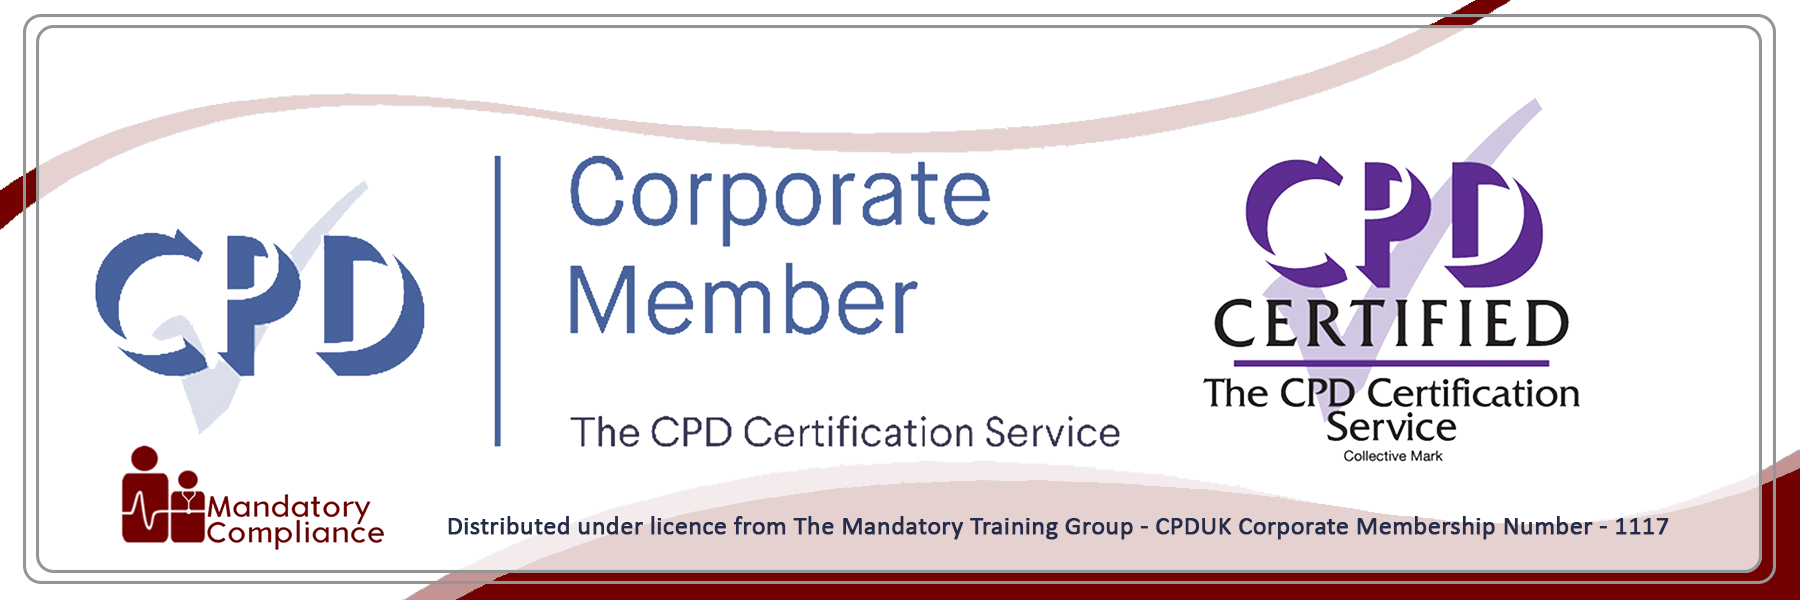 Leadership and Influence Training - E-Learning Courses - Mandatory Compliance UK -